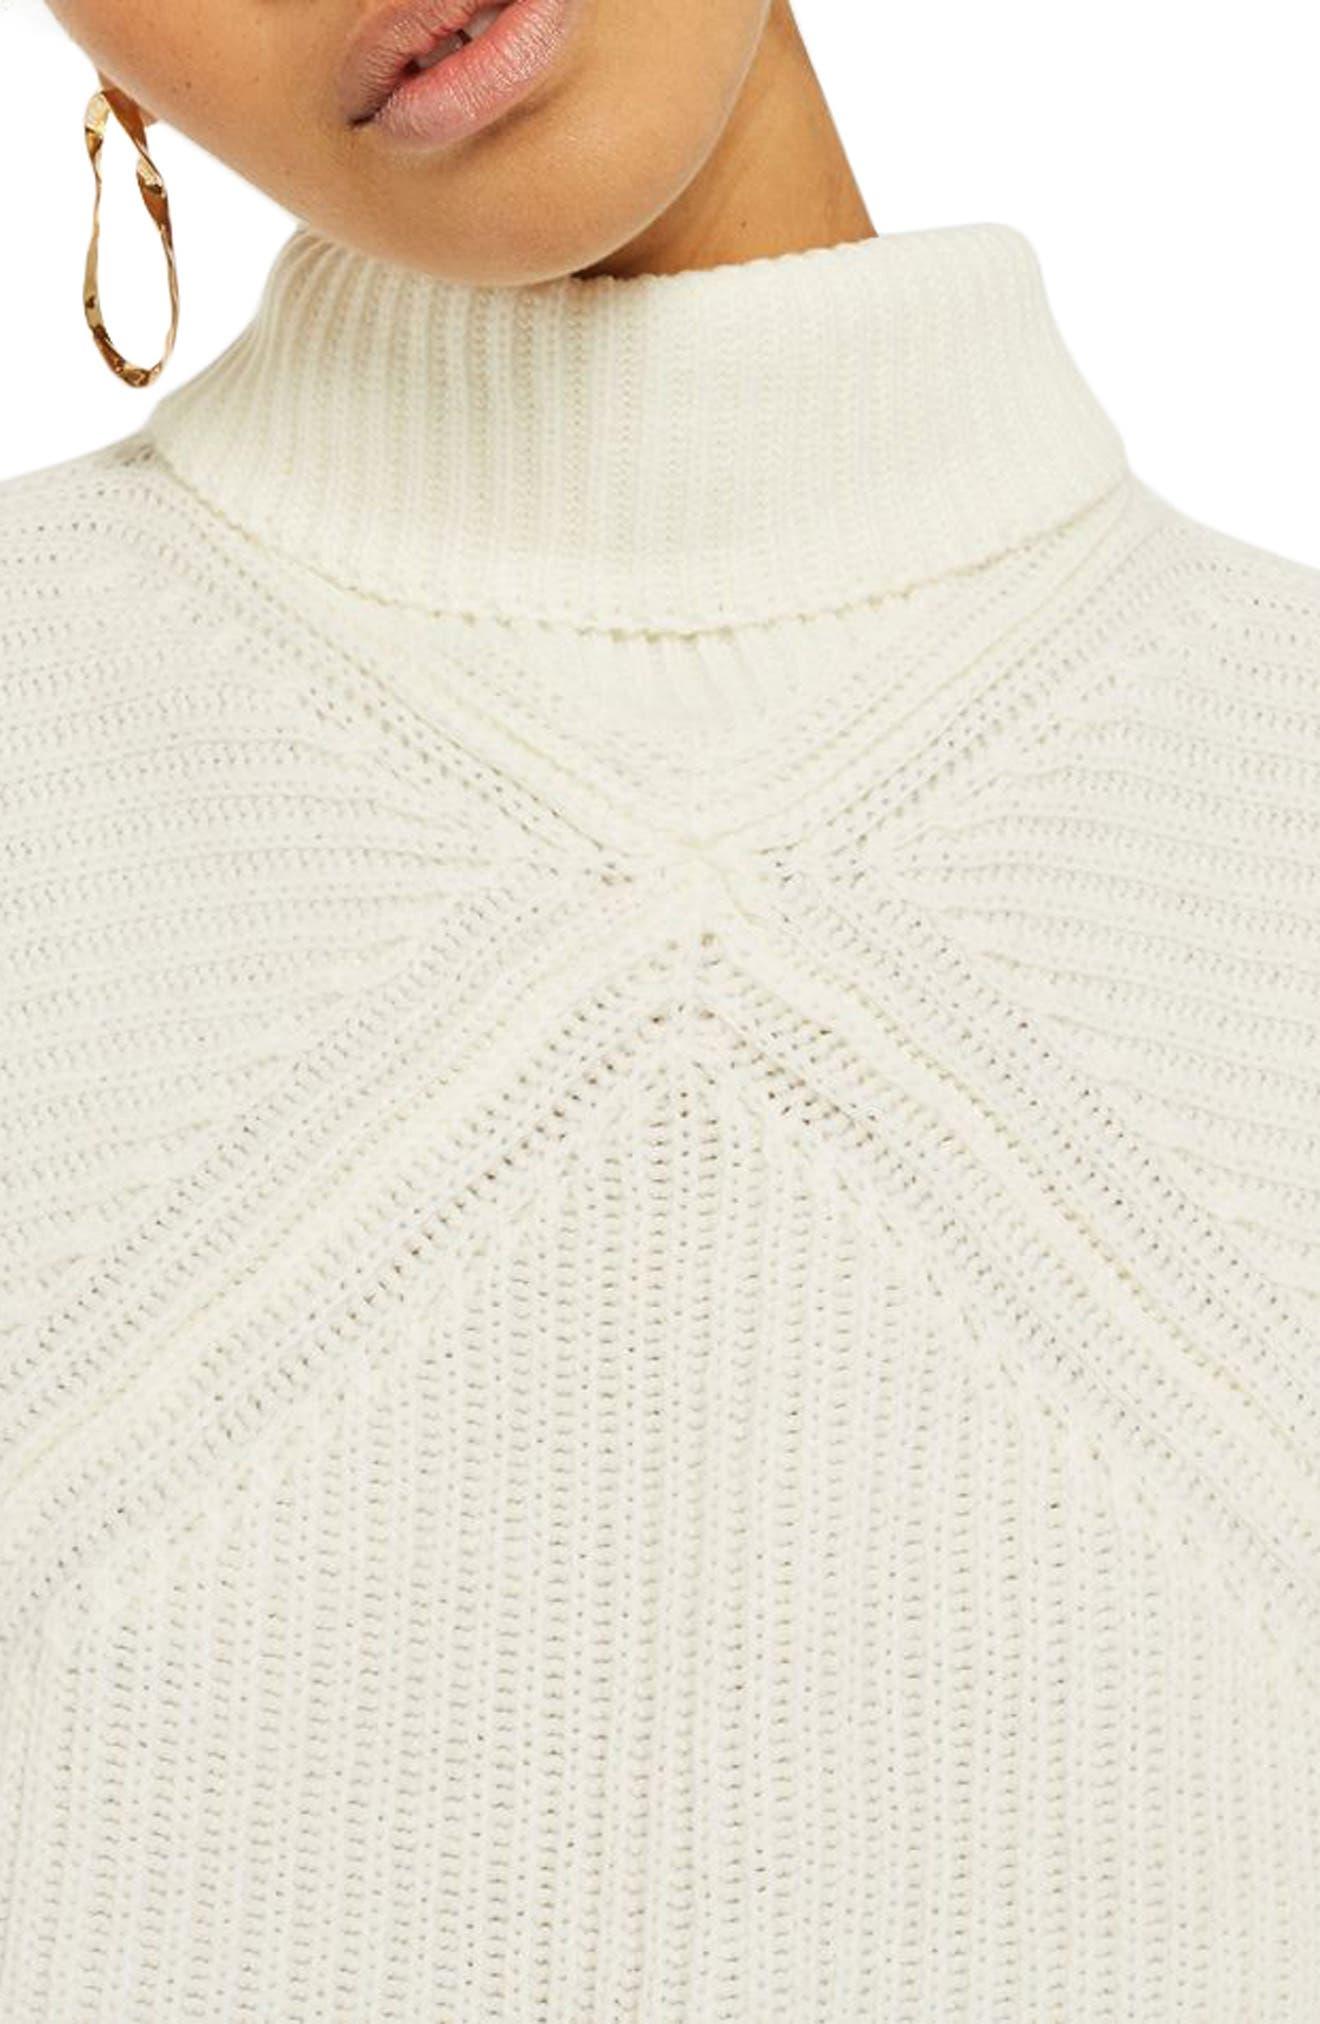 Diamond Stitch Turtleneck Sweater,                             Alternate thumbnail 3, color,                             900